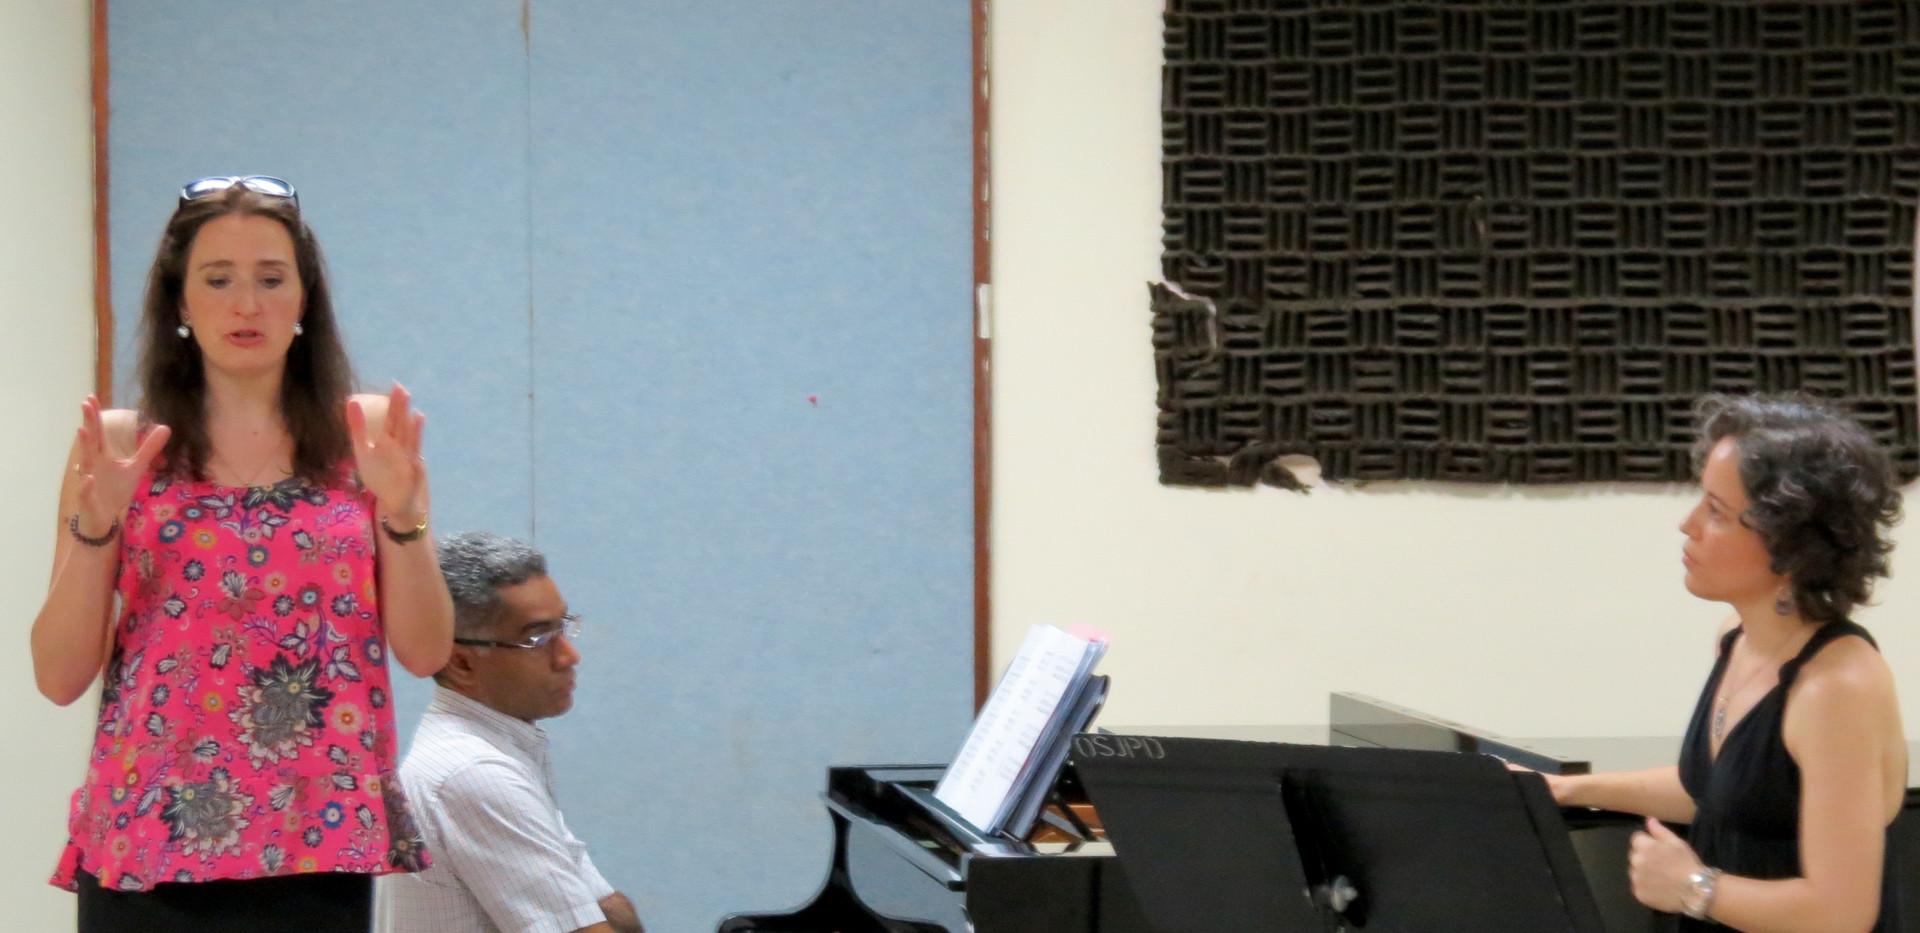 Josefien Focusing the Sound.jpg